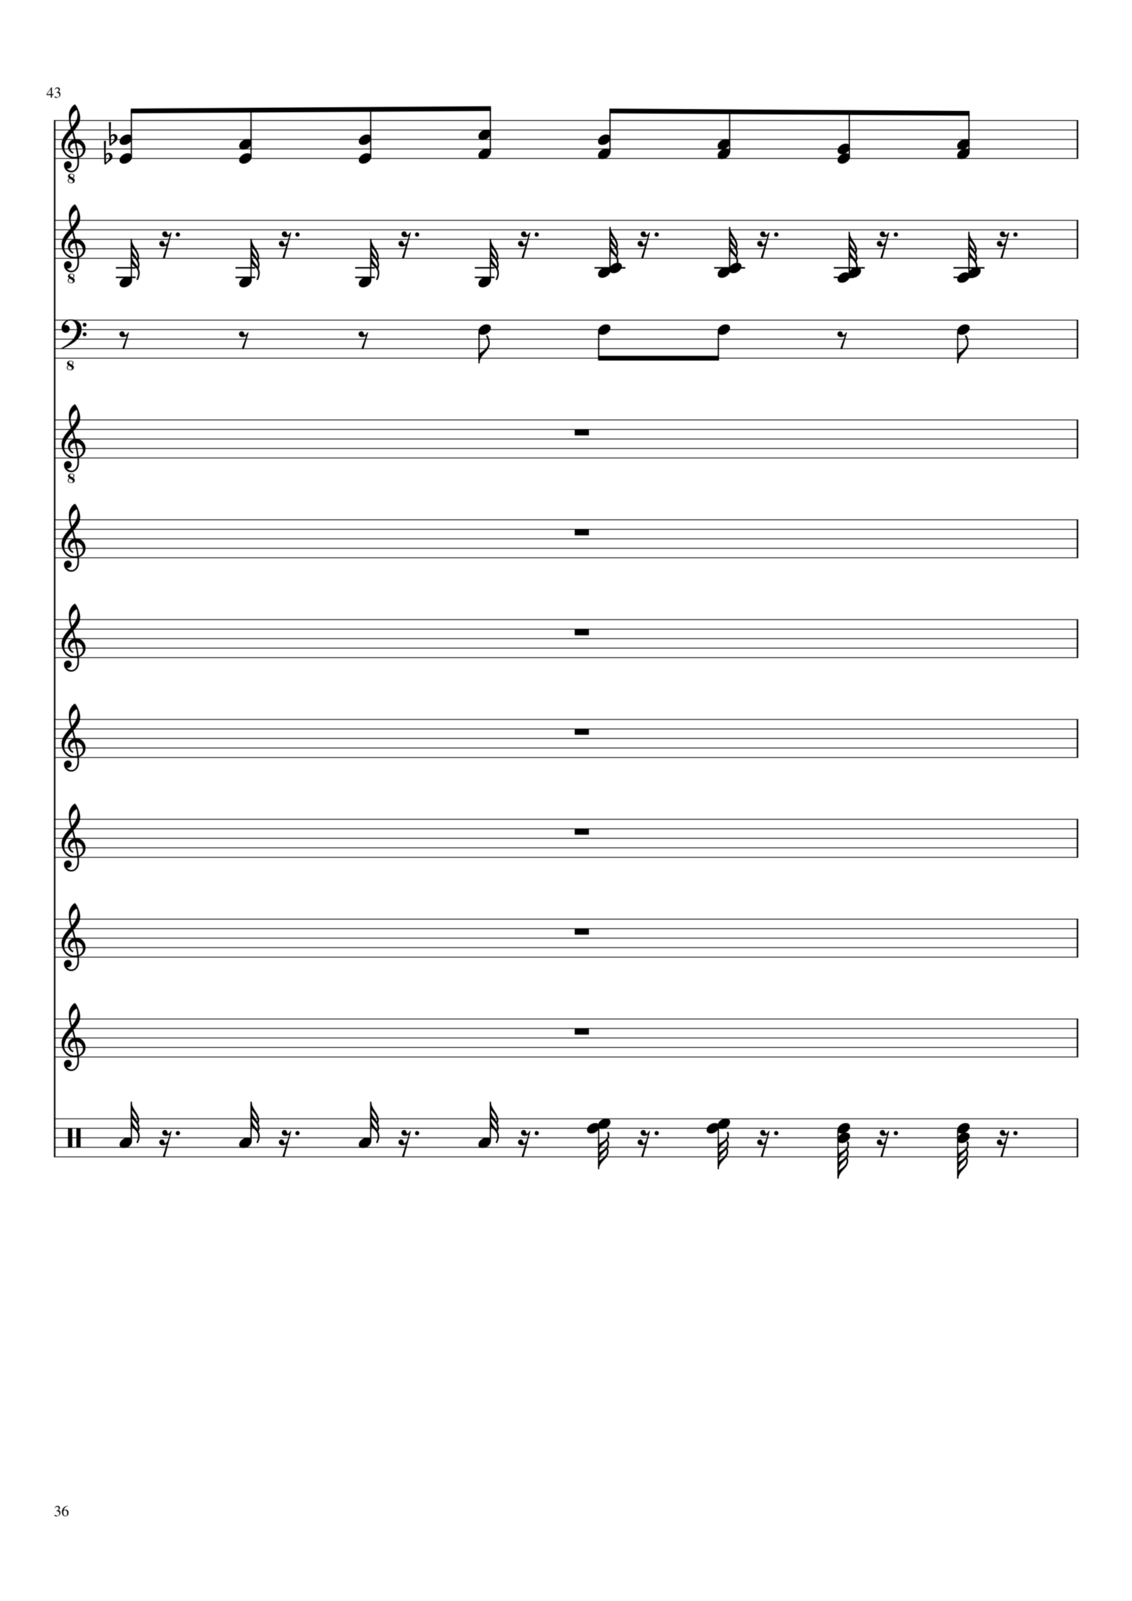 Belyiy sokol slide, Image 36